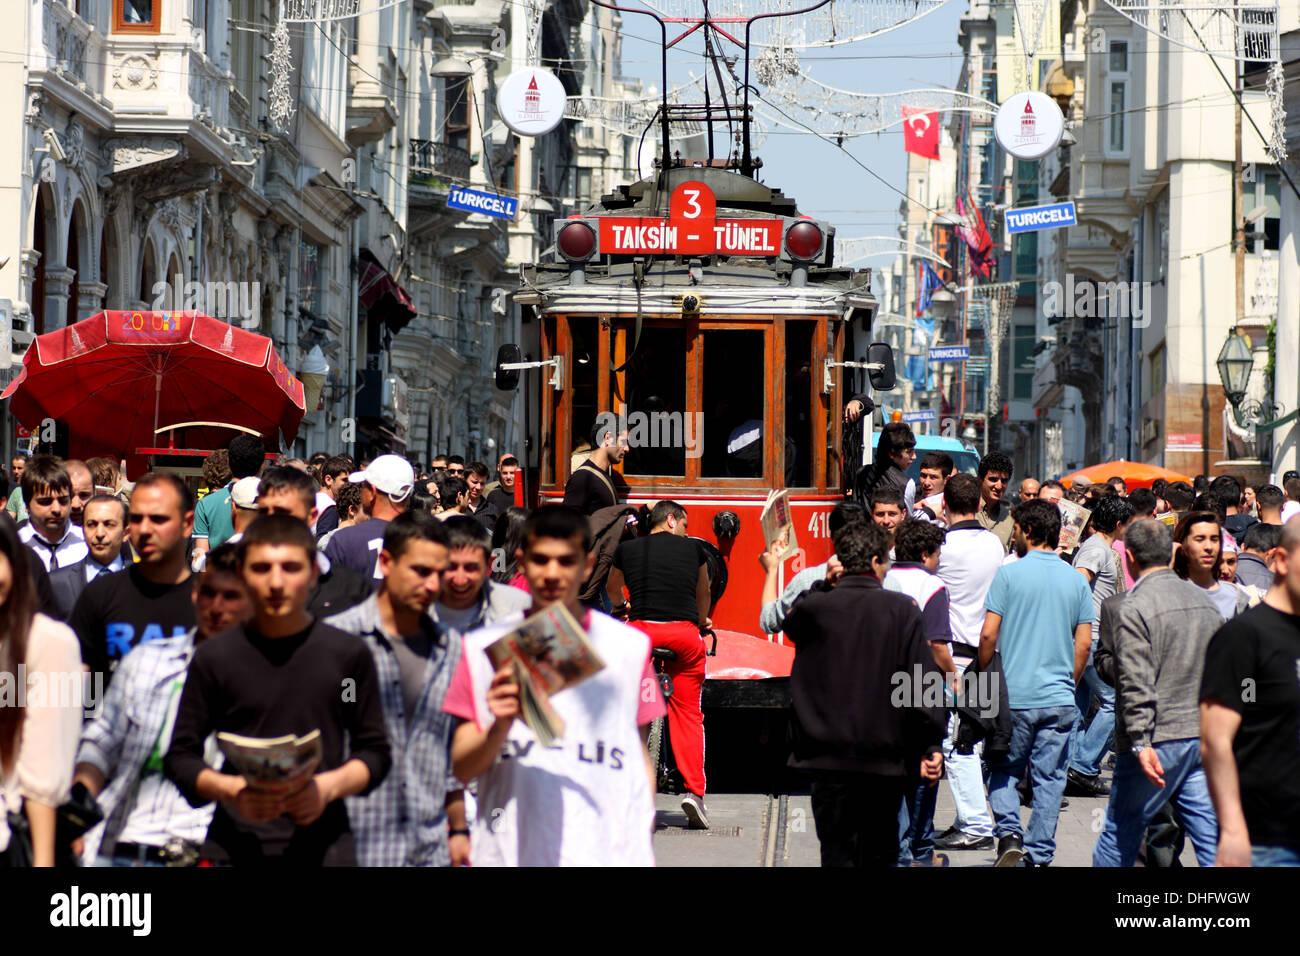 Tram on a crowded Istiklal Caddesi, Istanbul, Republic of TurkeyStock Photo